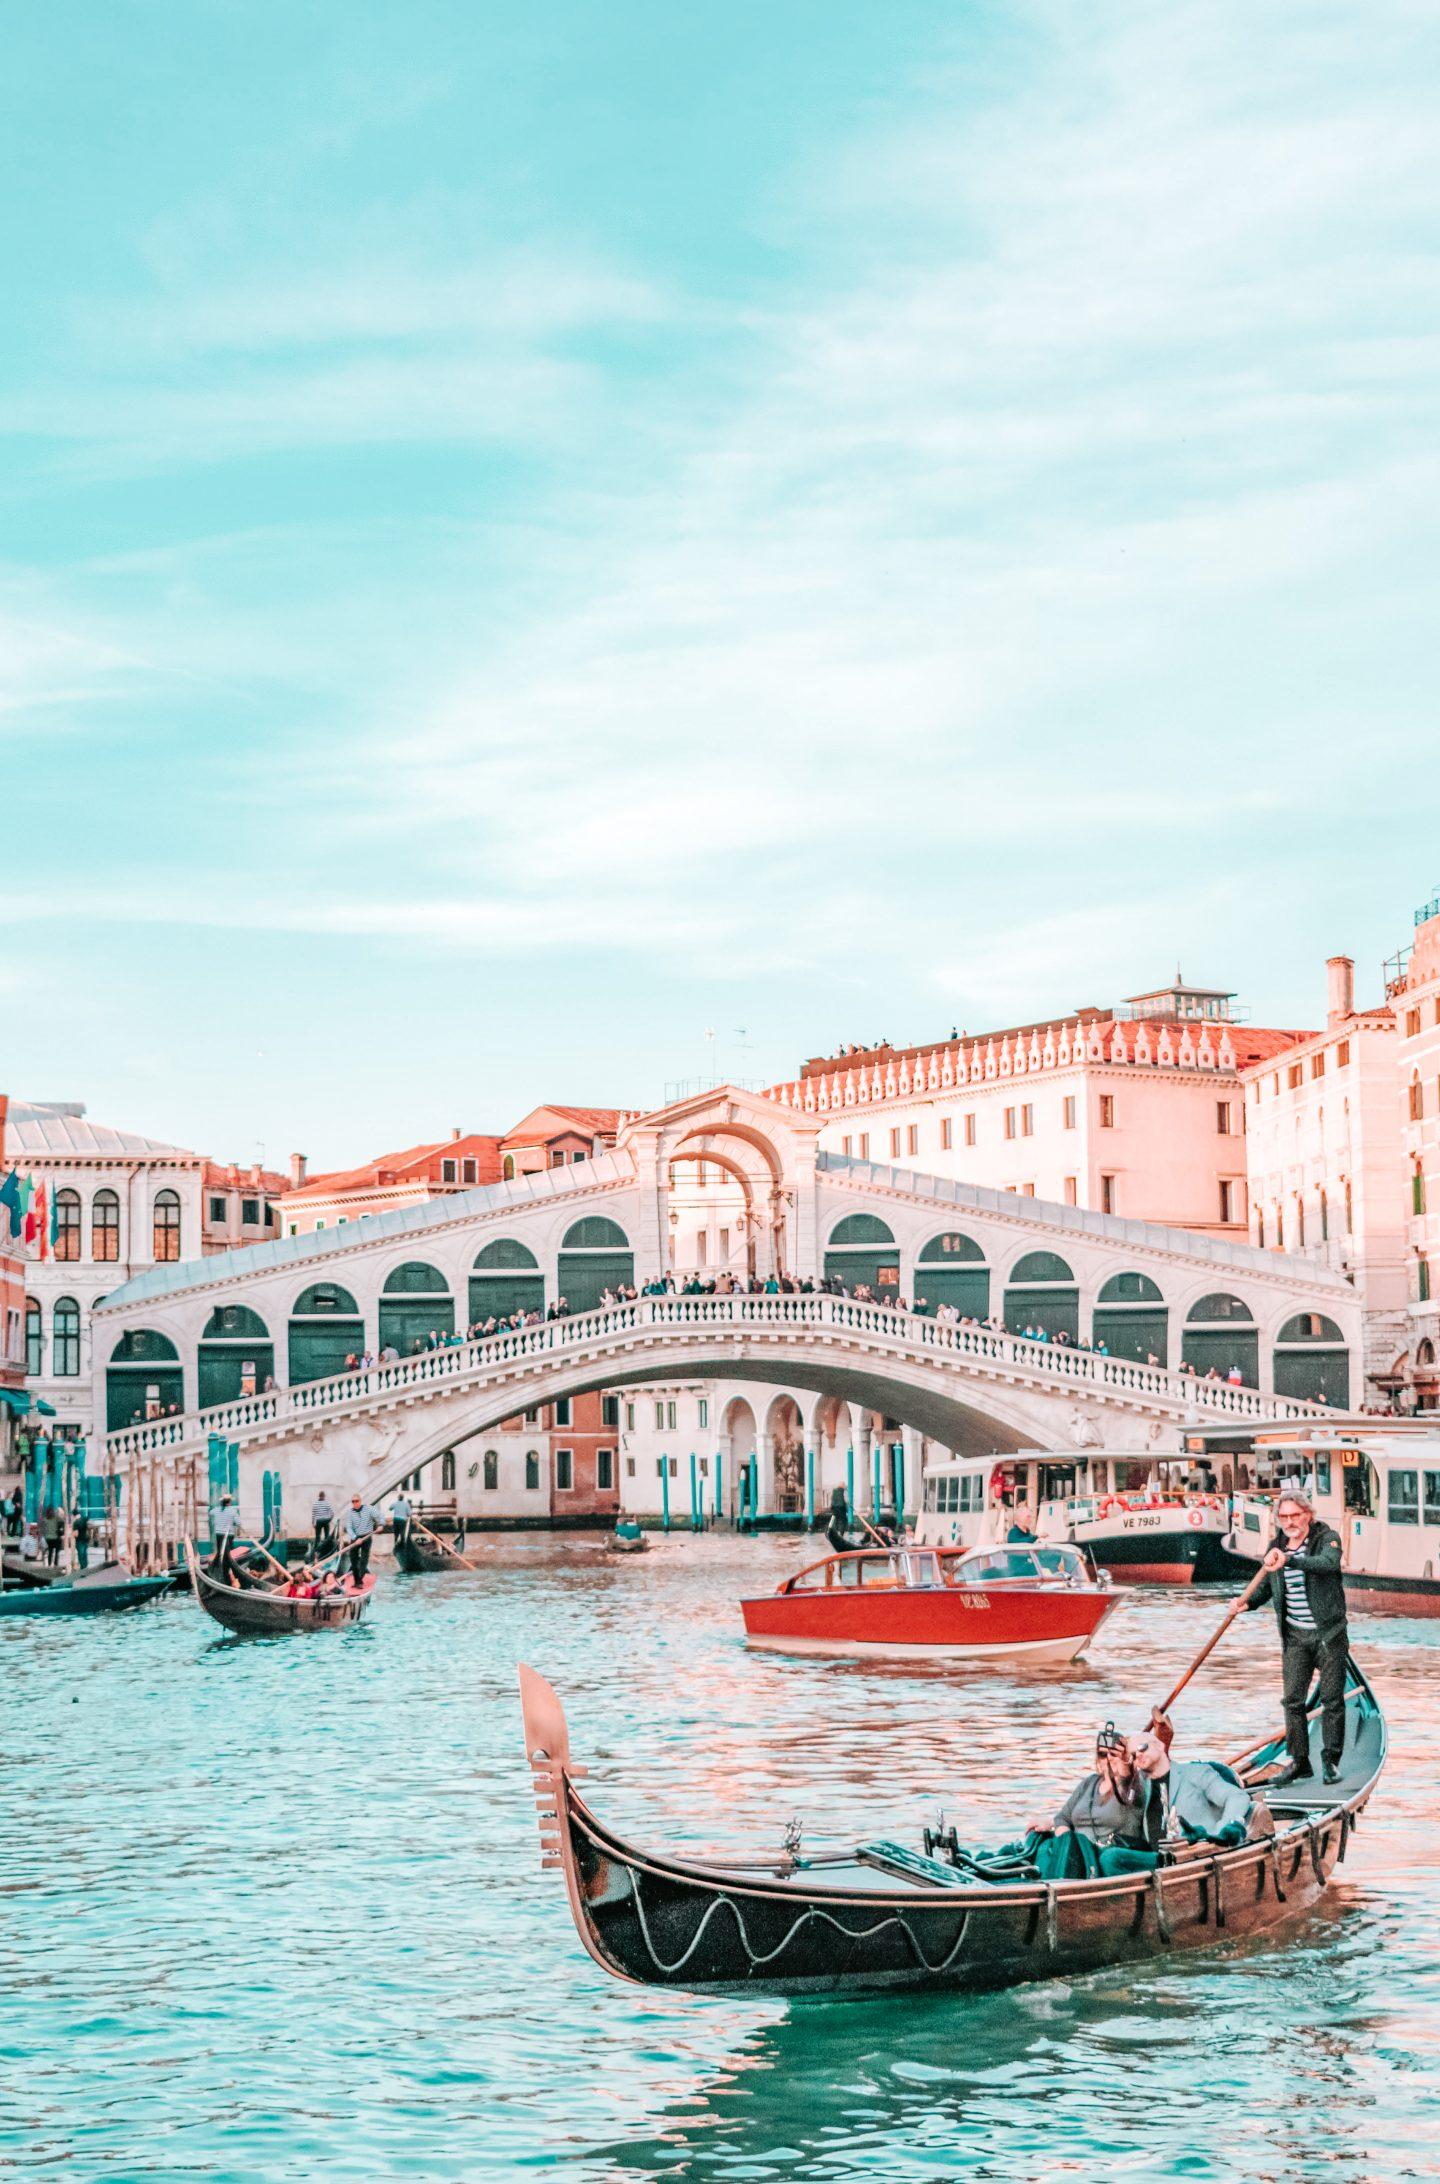 Venice-gondola-ride-romantic-destinations-europe